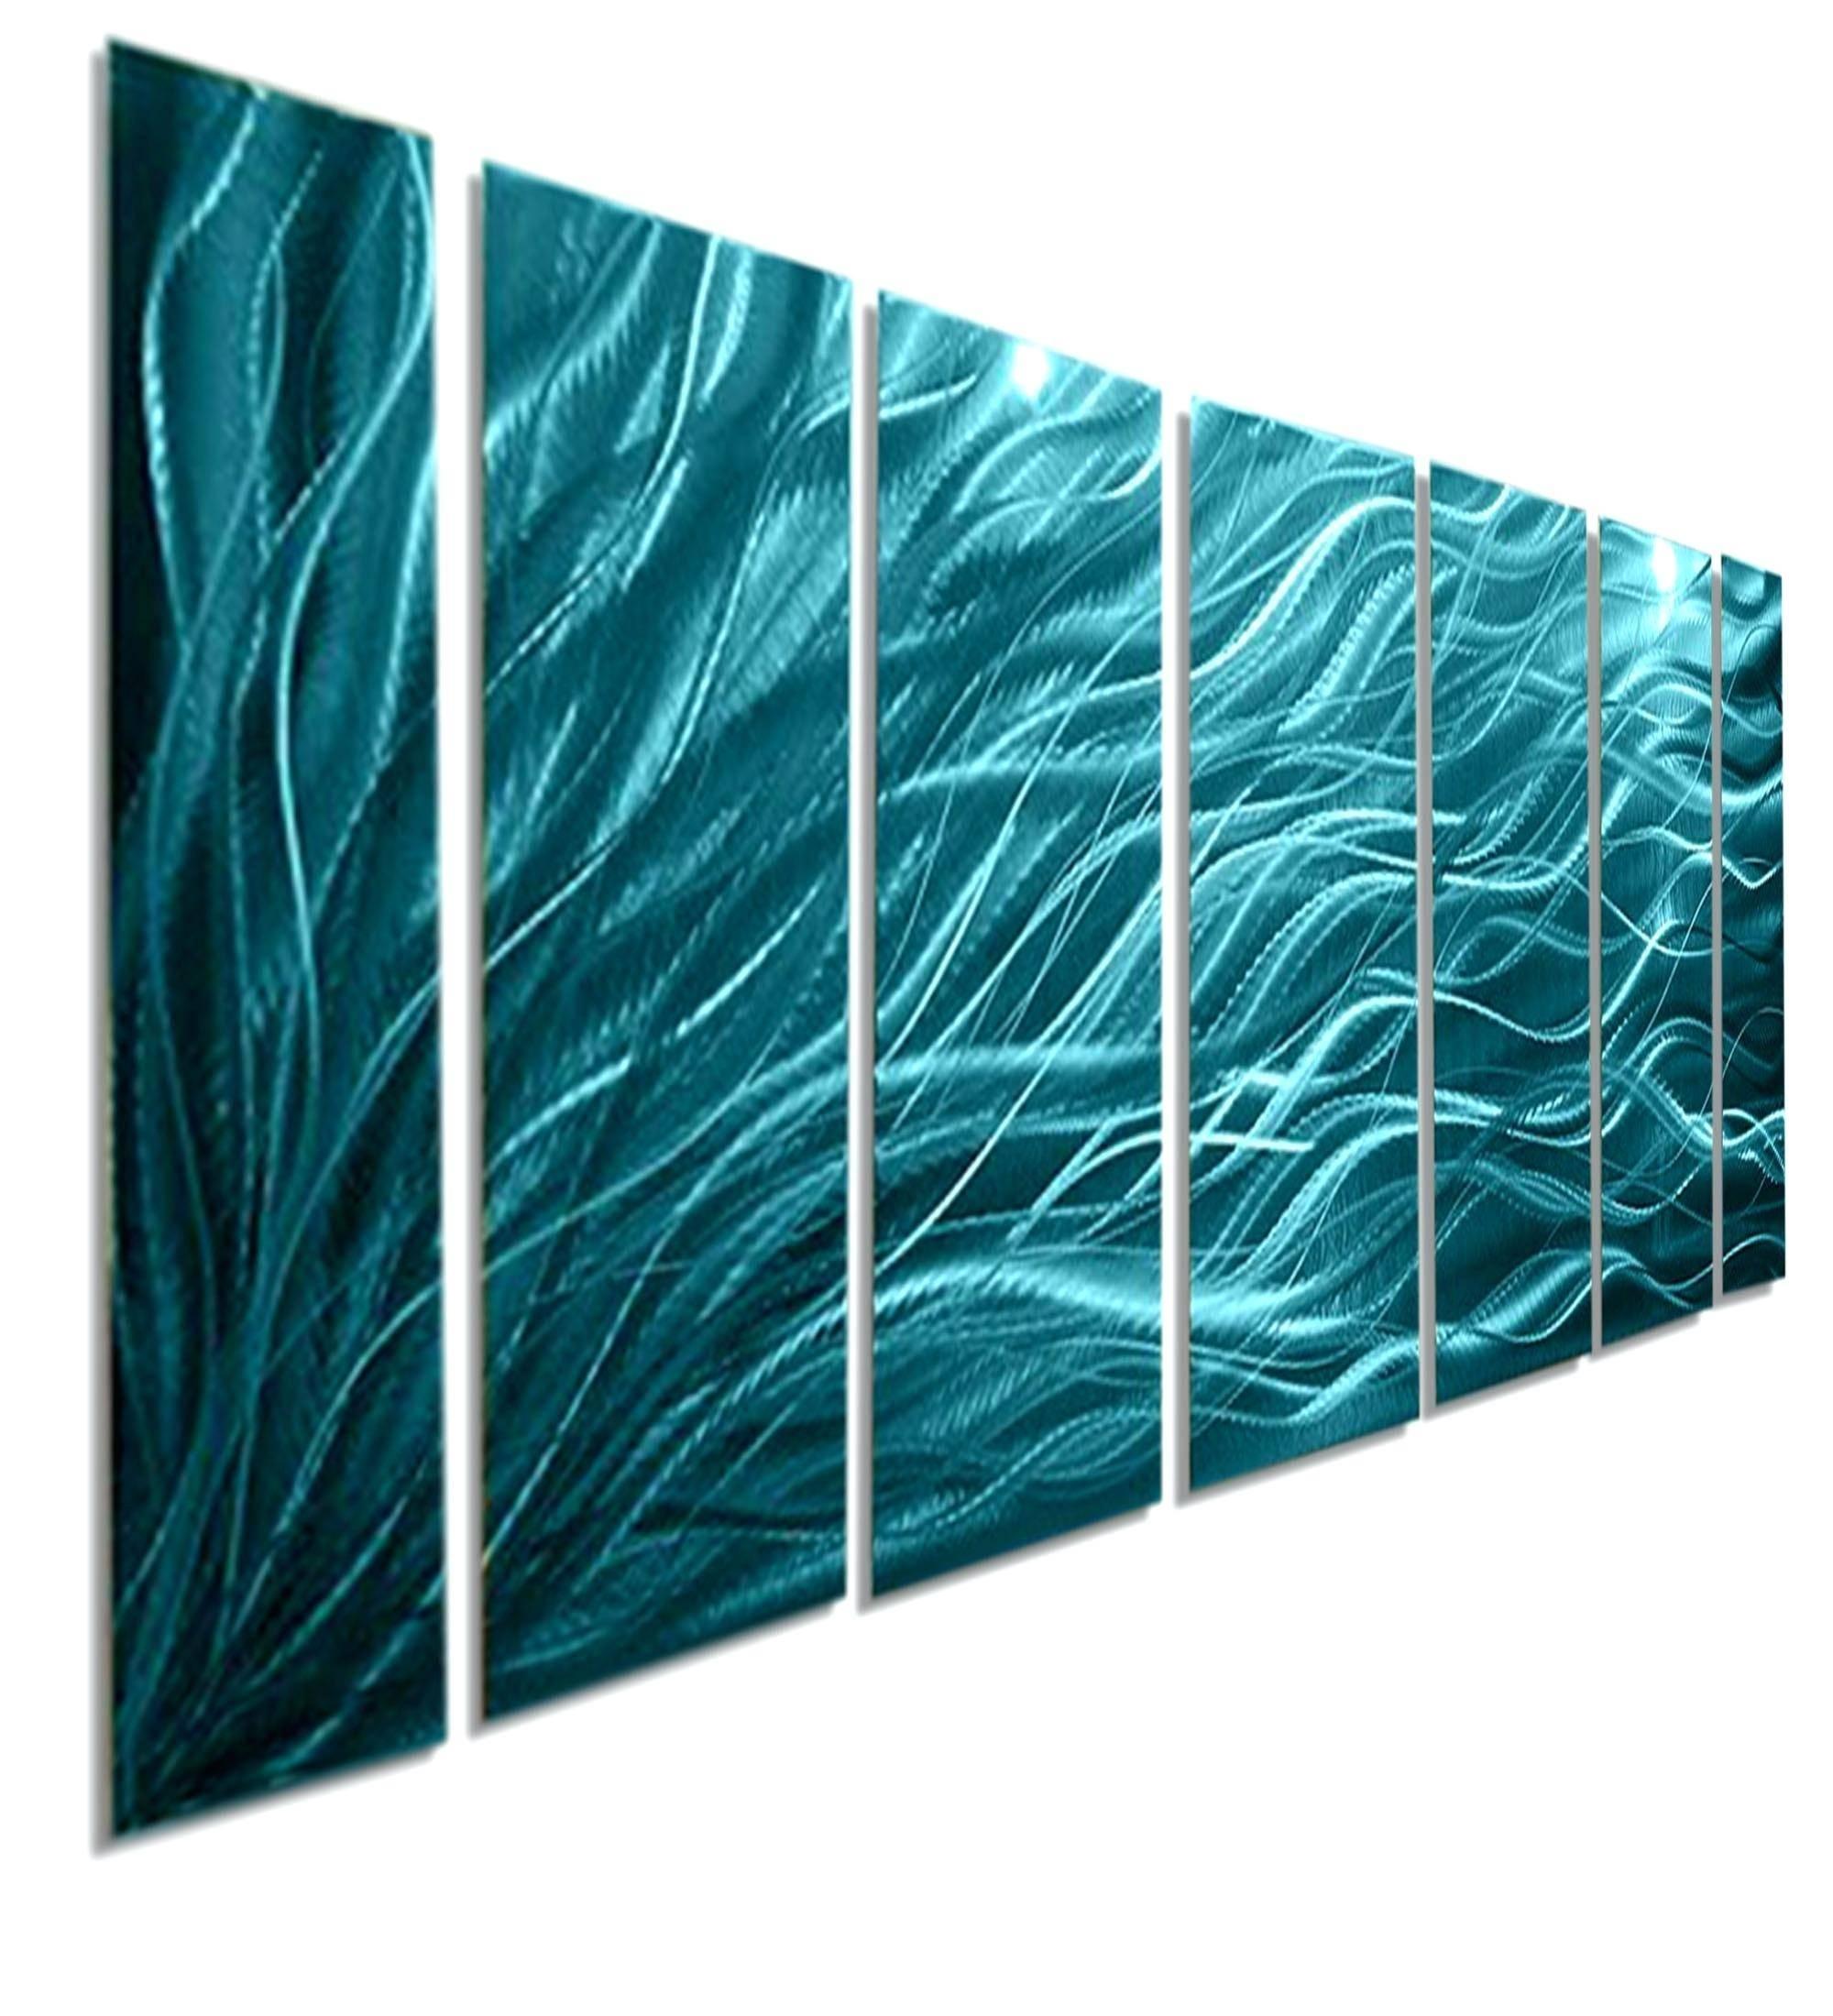 Wall Ideas : Mgctlbxnmzp Mgctlbxv5114 Mgctlbxlc Metal Wall Art For Newest Ash Carl Metal Wall Art (View 26 of 30)